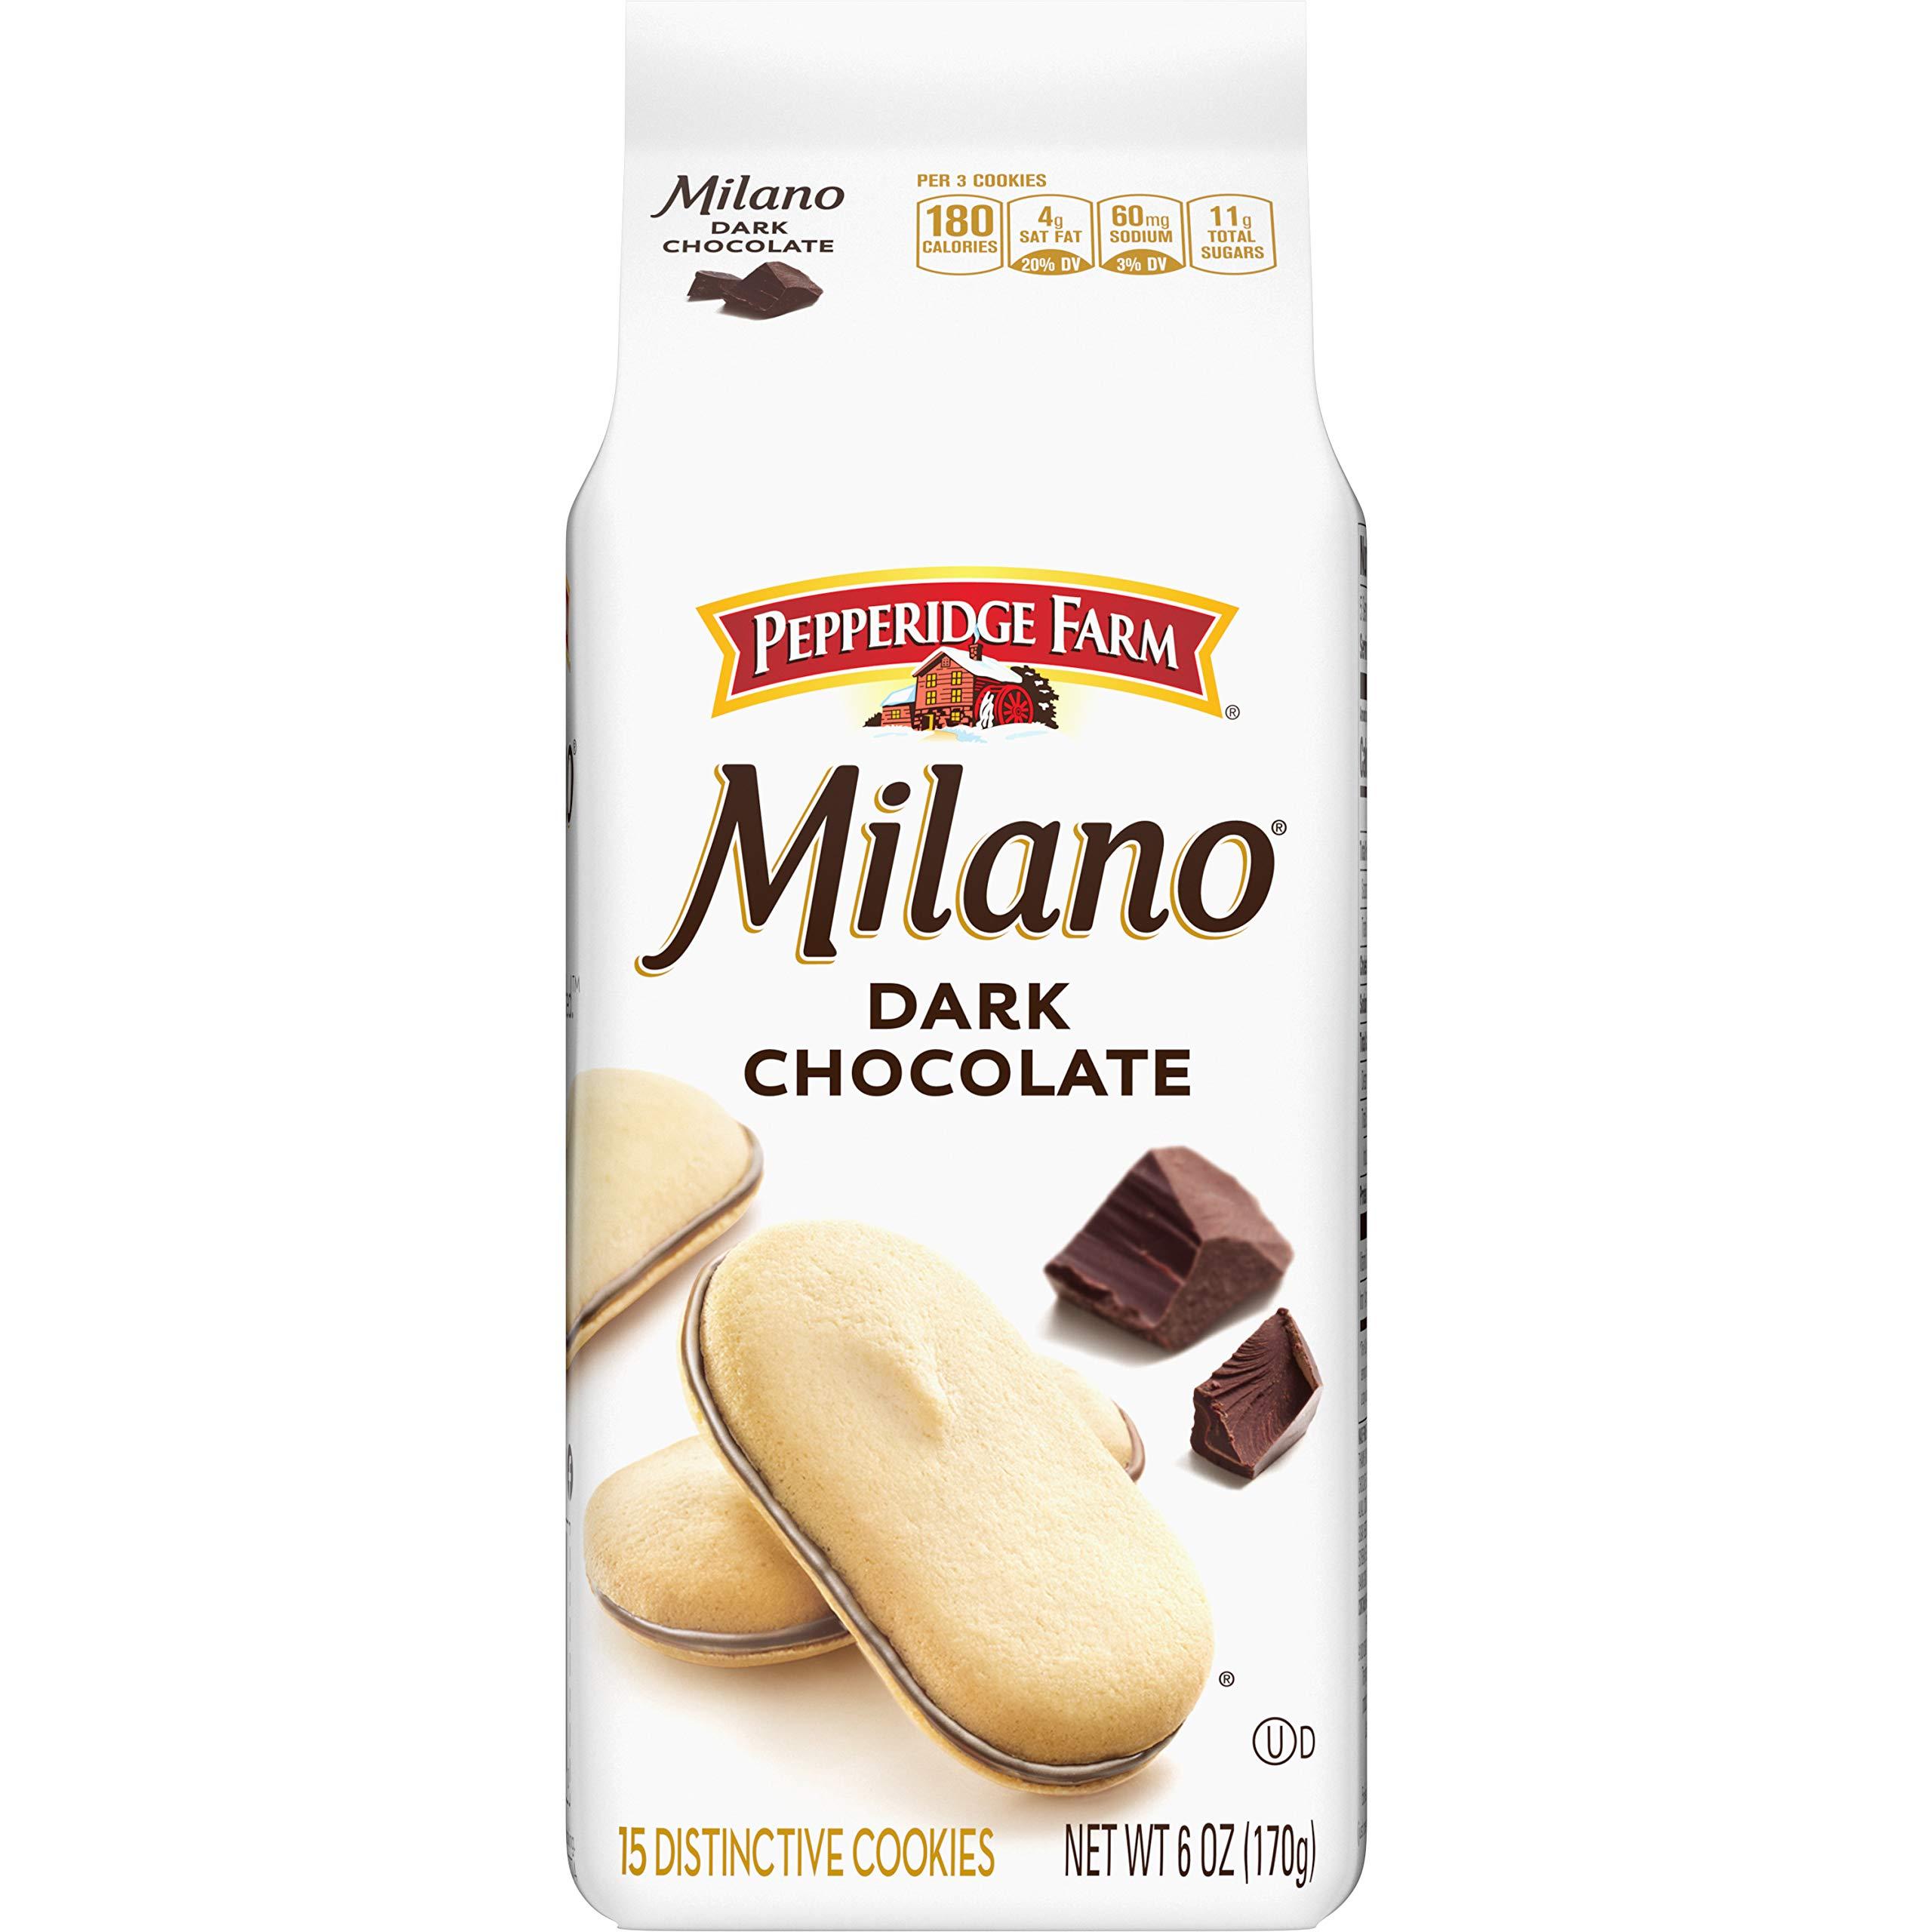 Pepperidge Farm Milano Dark Chocolate Cookies, 6 oz. Bag